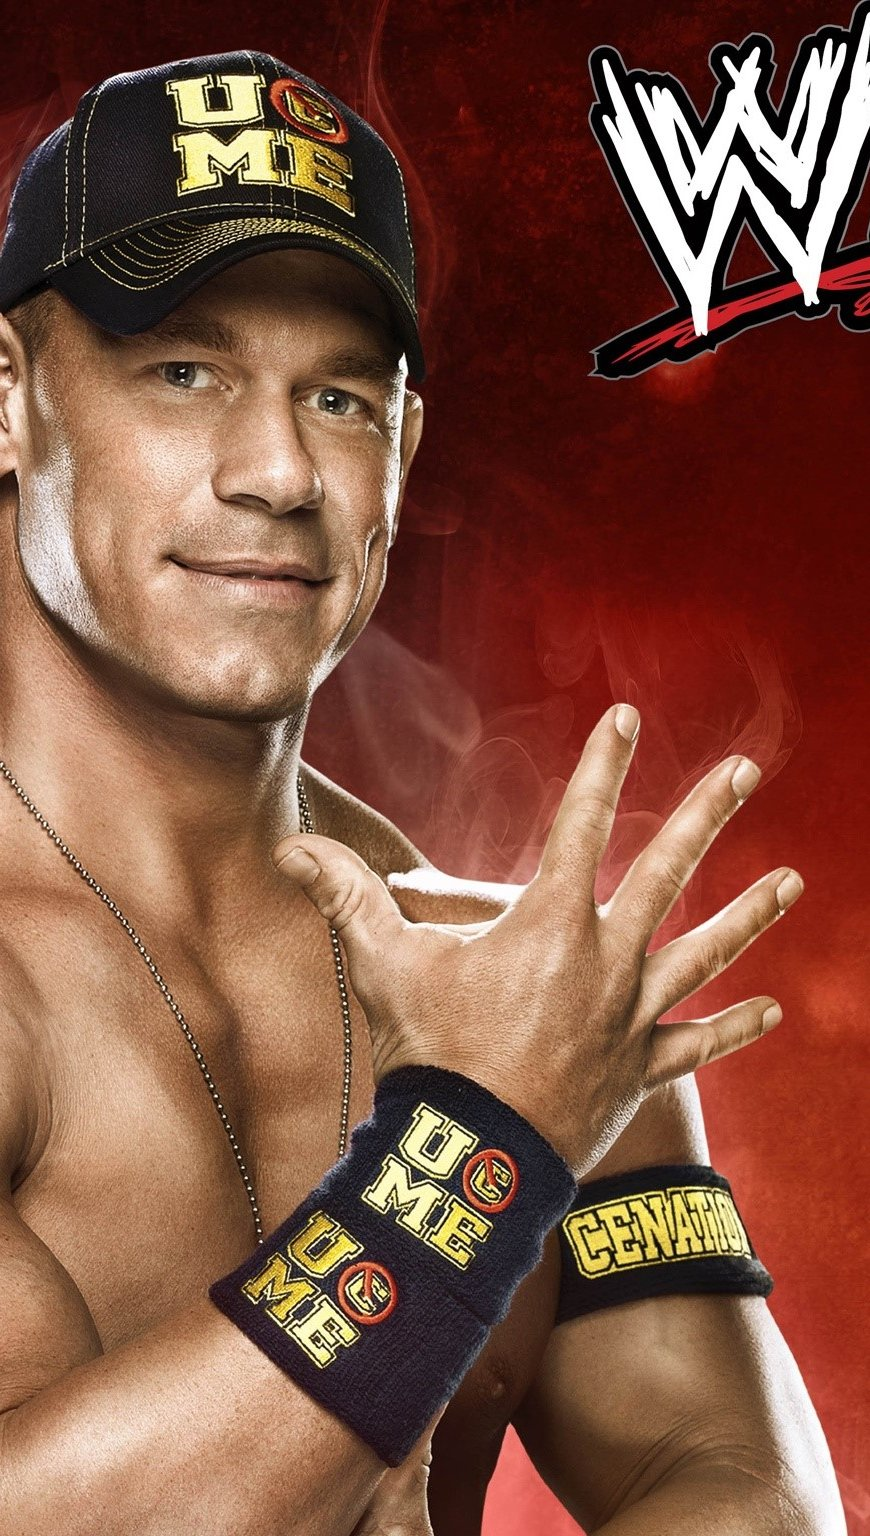 Fondos de pantalla John Cena WWE Vertical